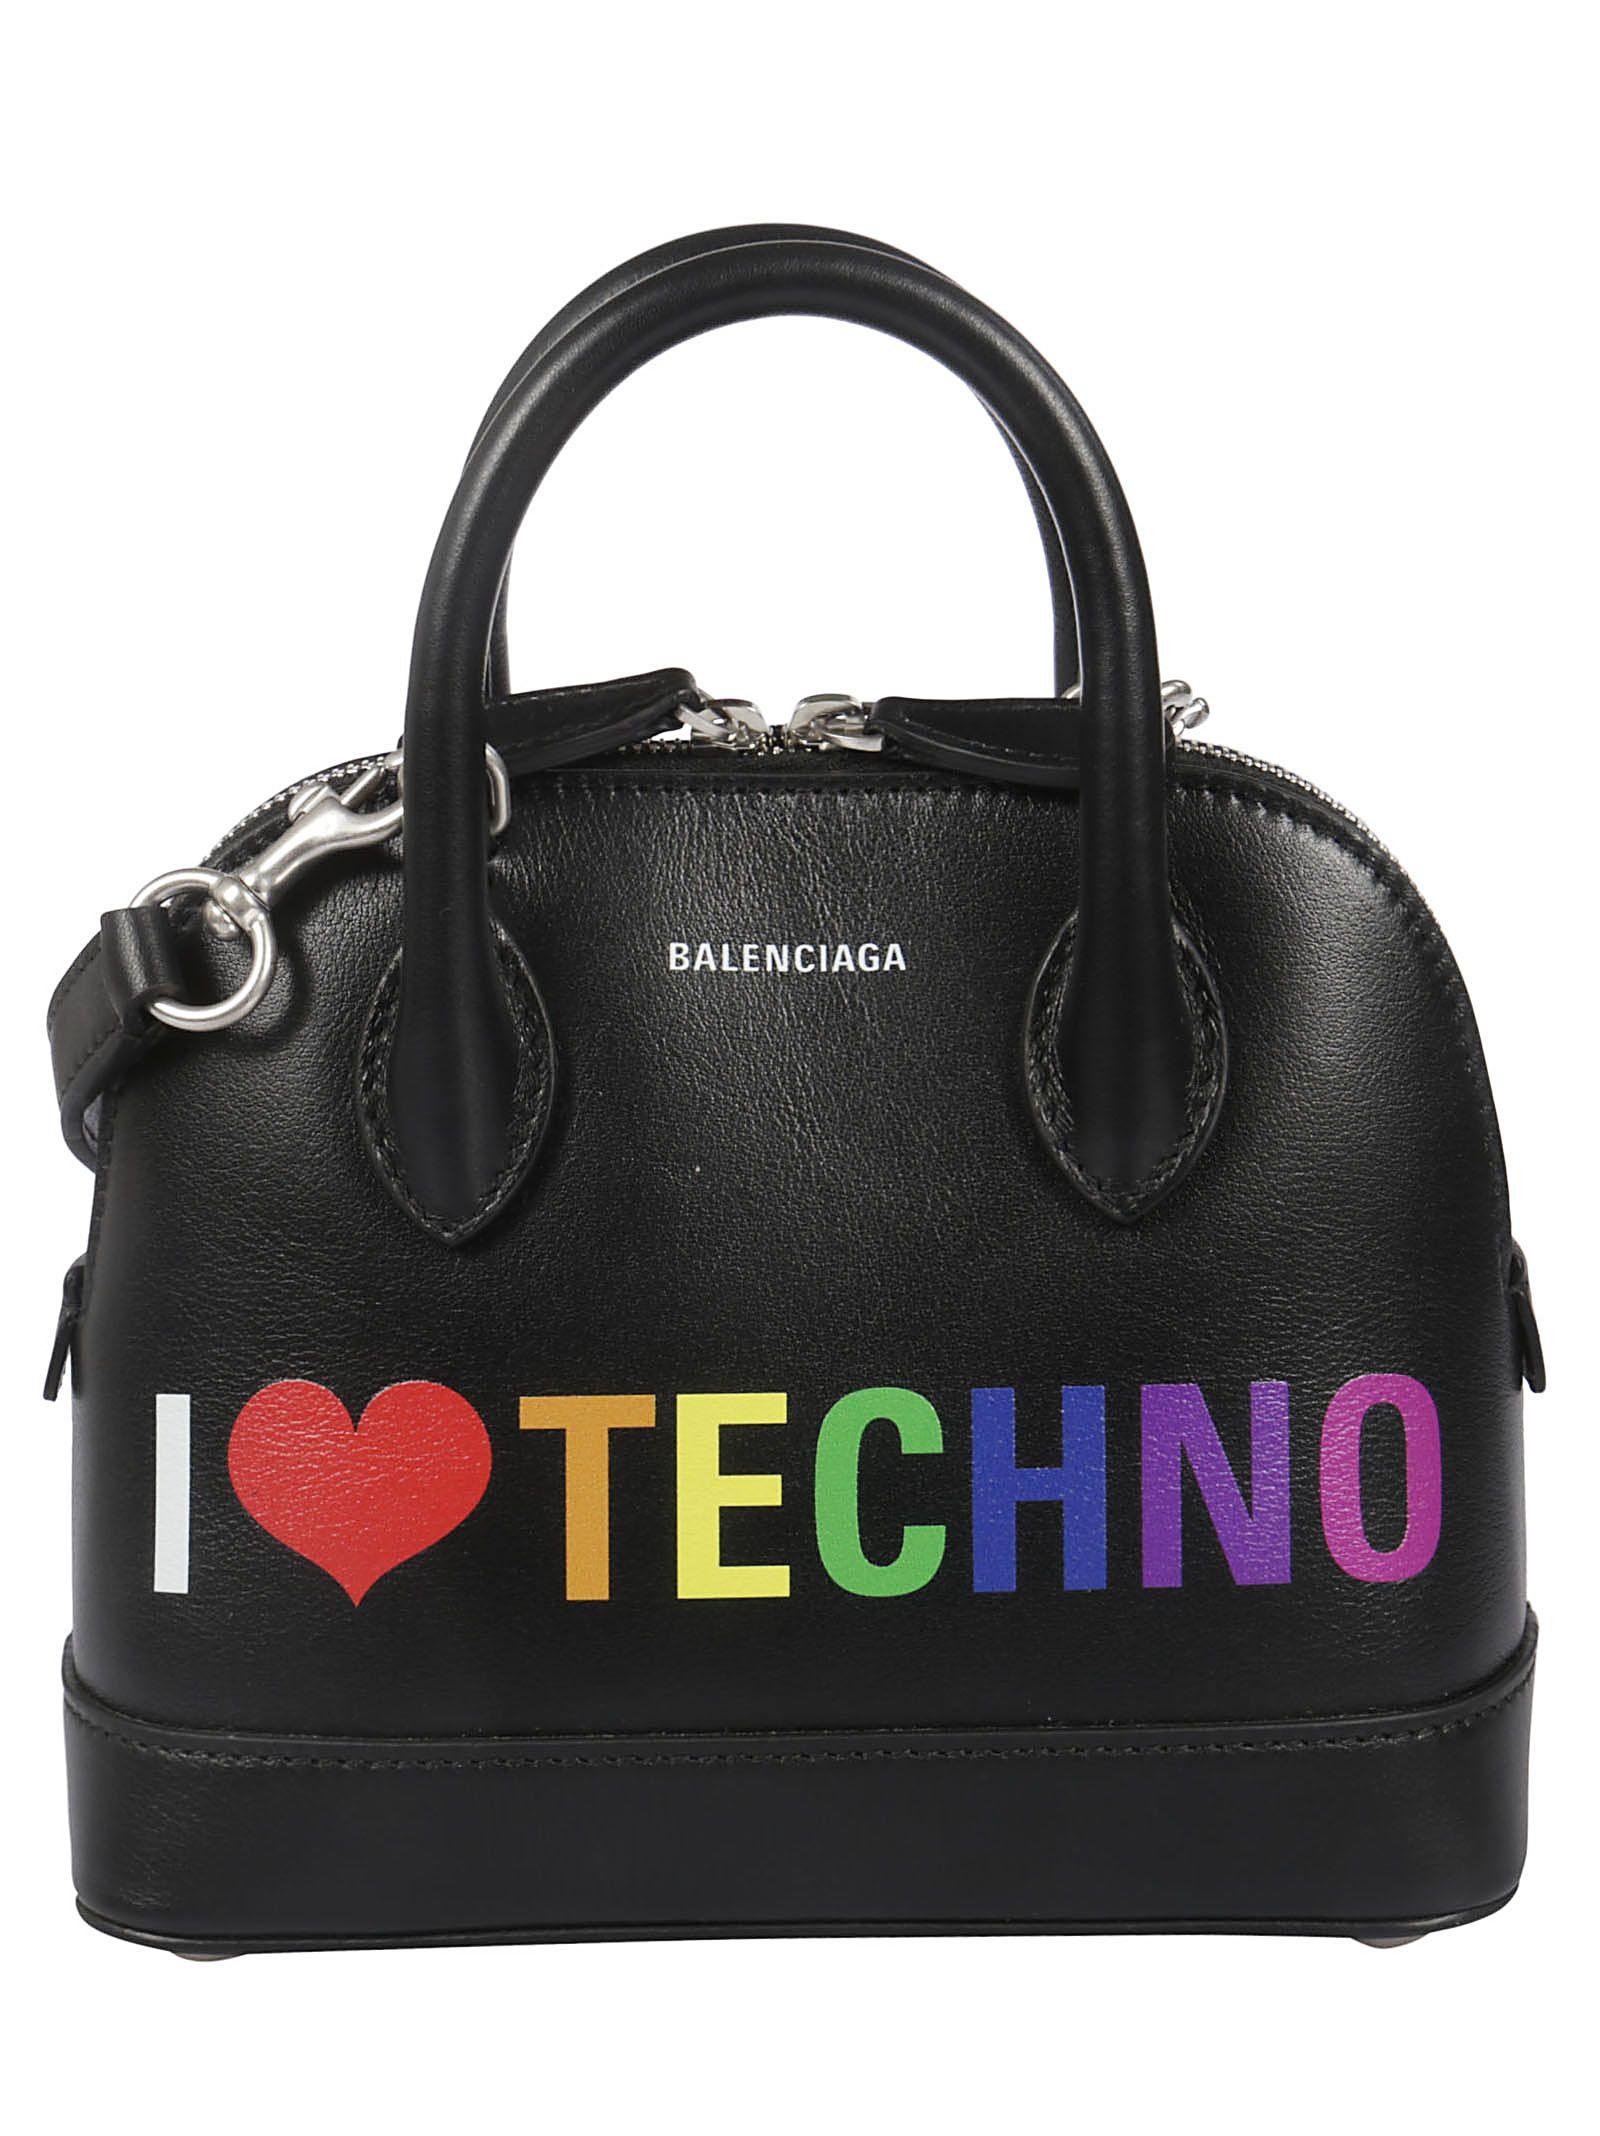 a33f5aa554a Balenciaga Balenciaga Extra Extra Small I Love Technoville Tote ...